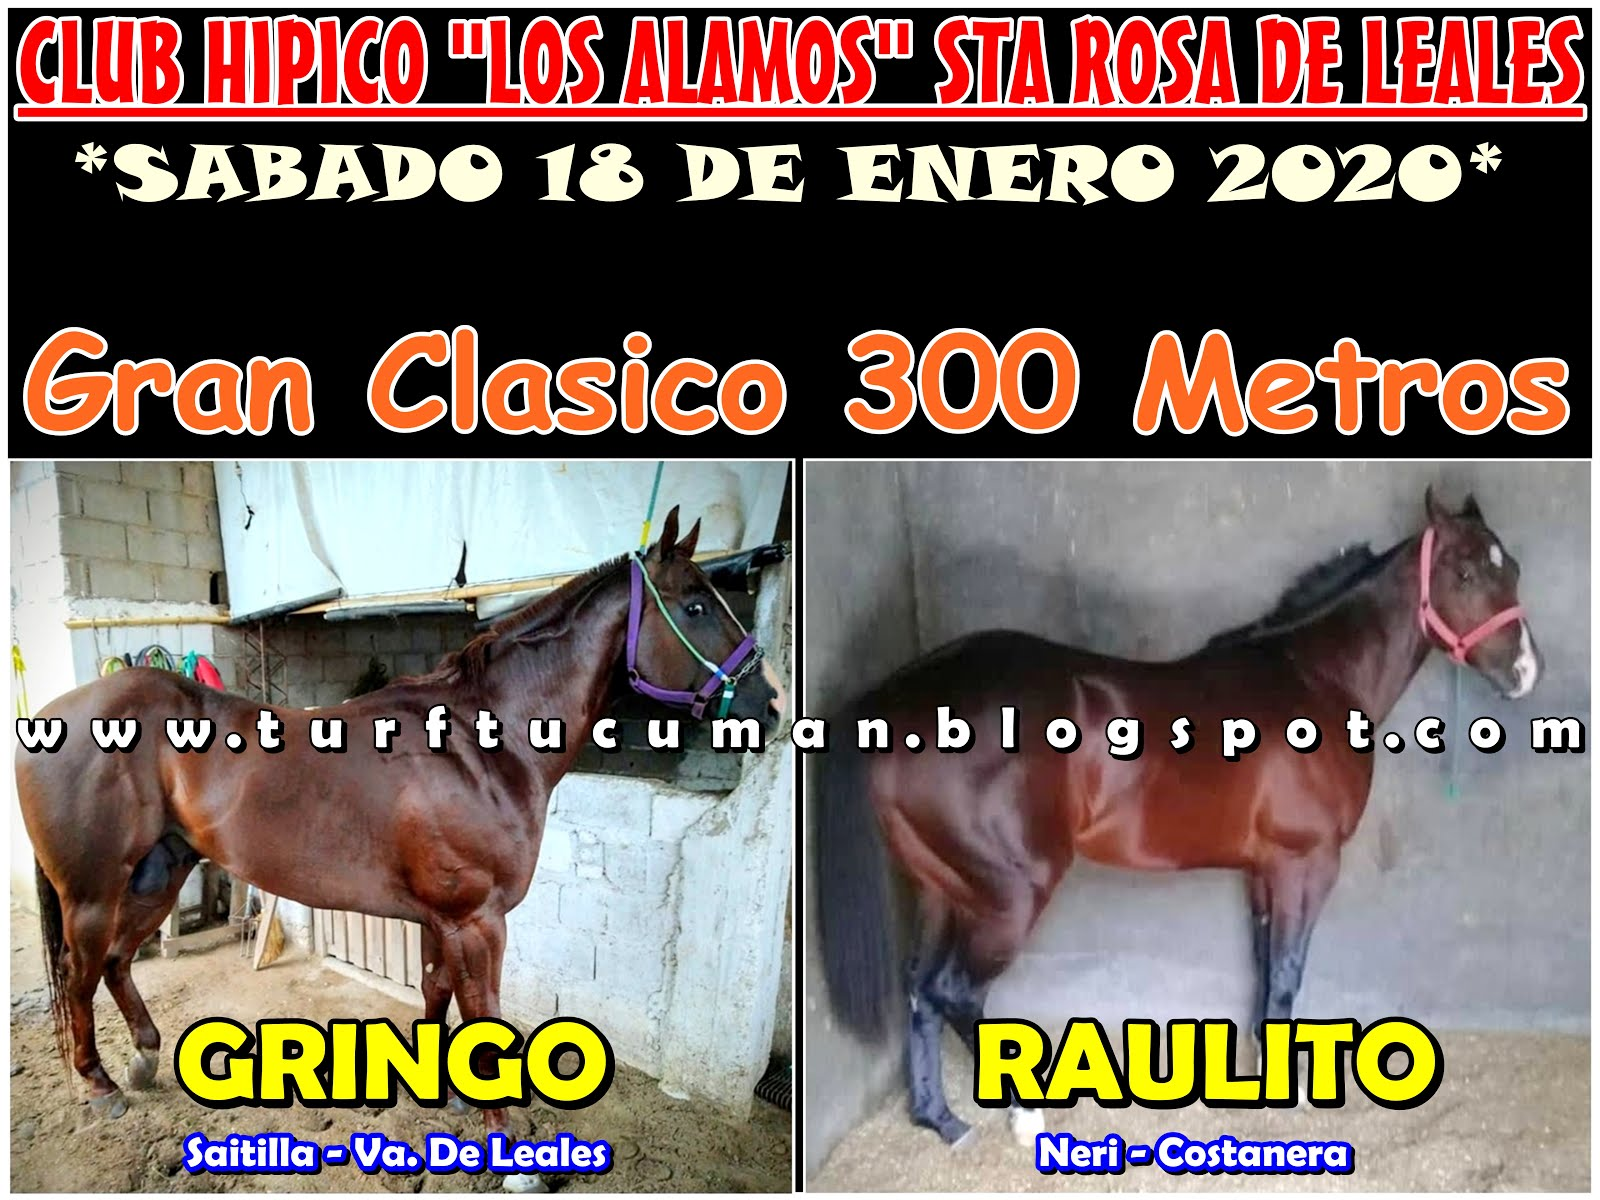 GRINGO VS RAULITO